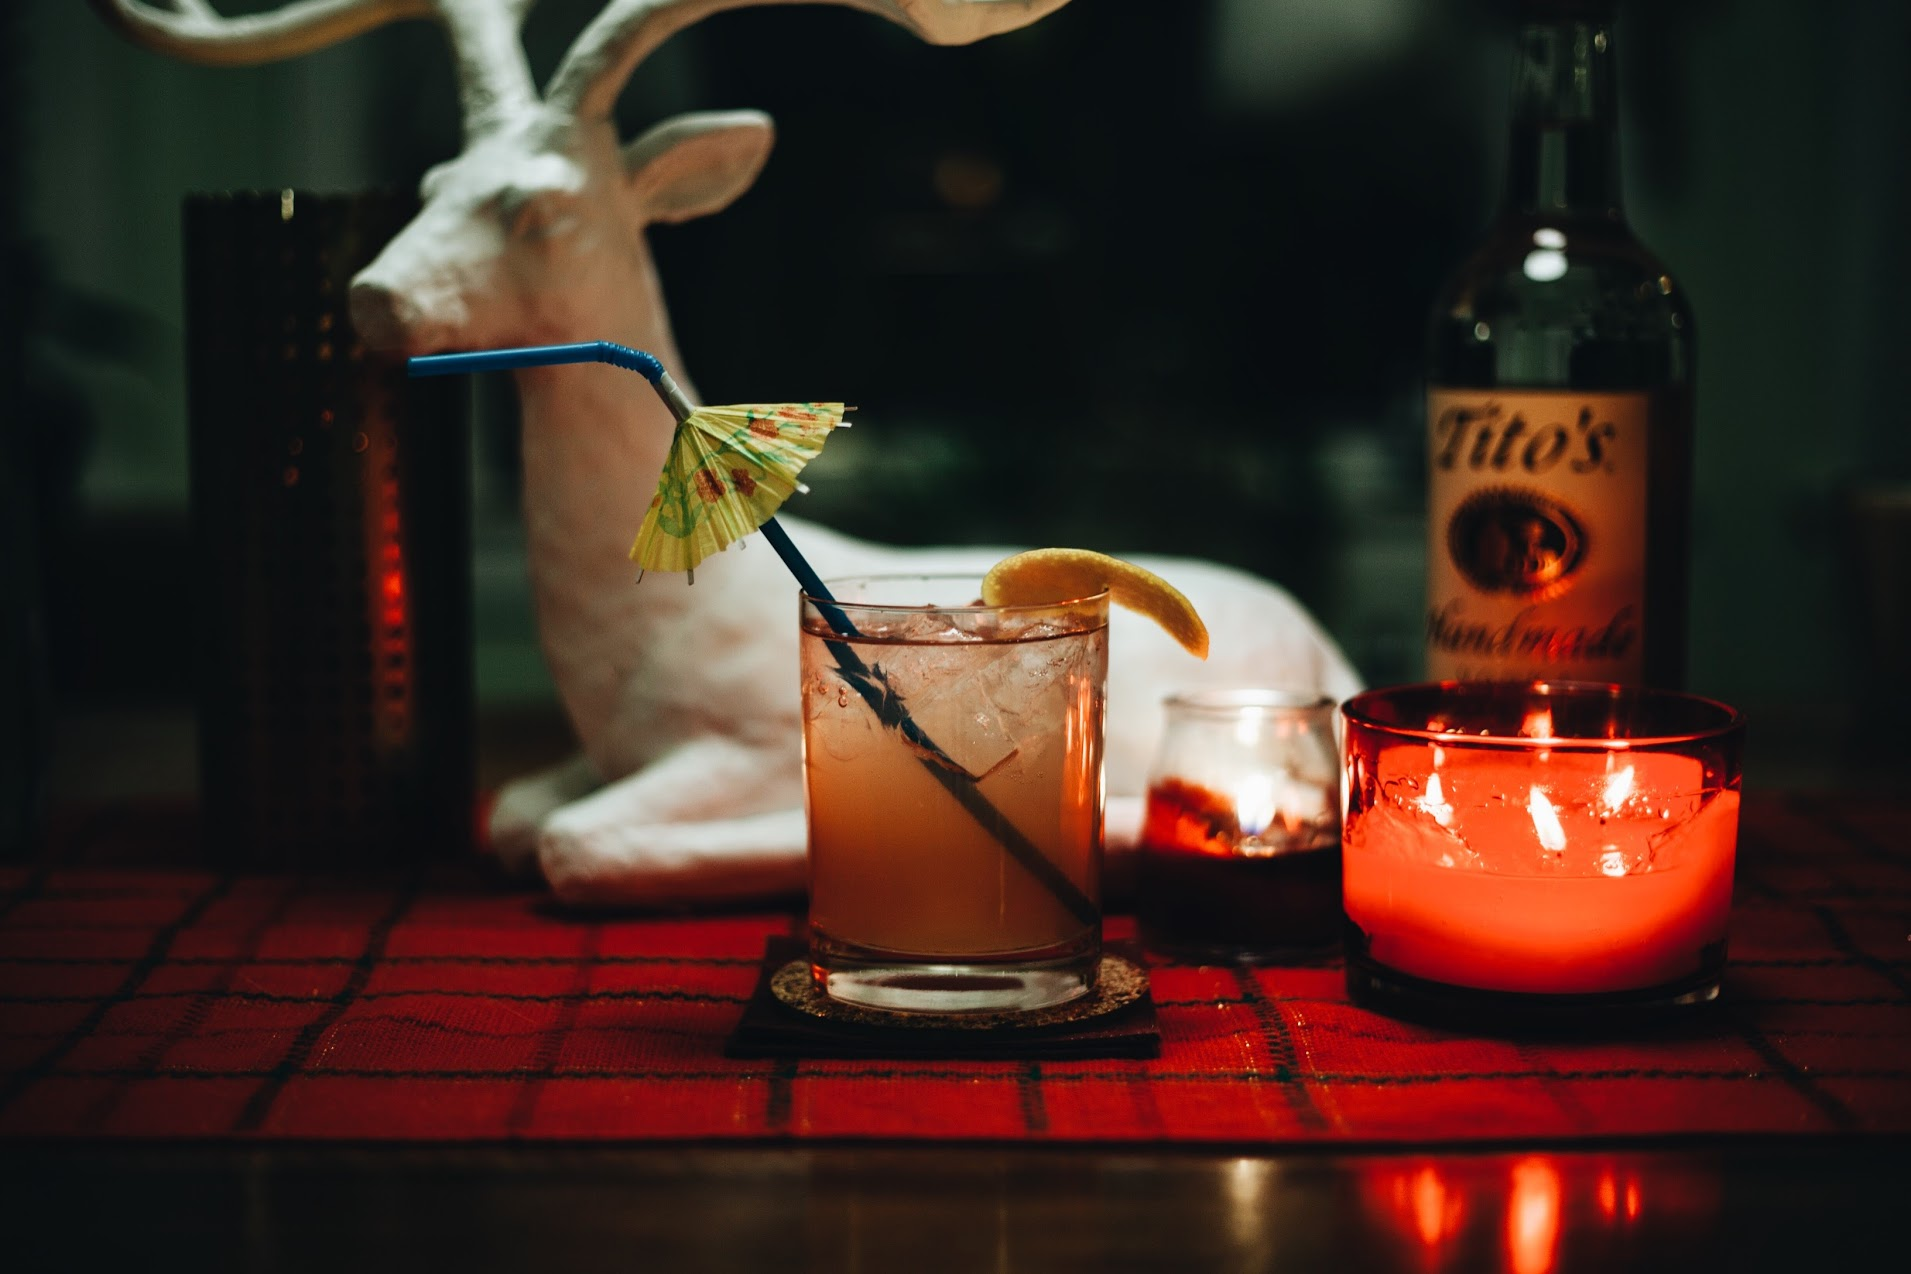 Tito's Grackle - 1 1/2 oz Tito's Handmade Vodka1/2 oz Fernet Branca2 oz fresh squeezed blood orange juice